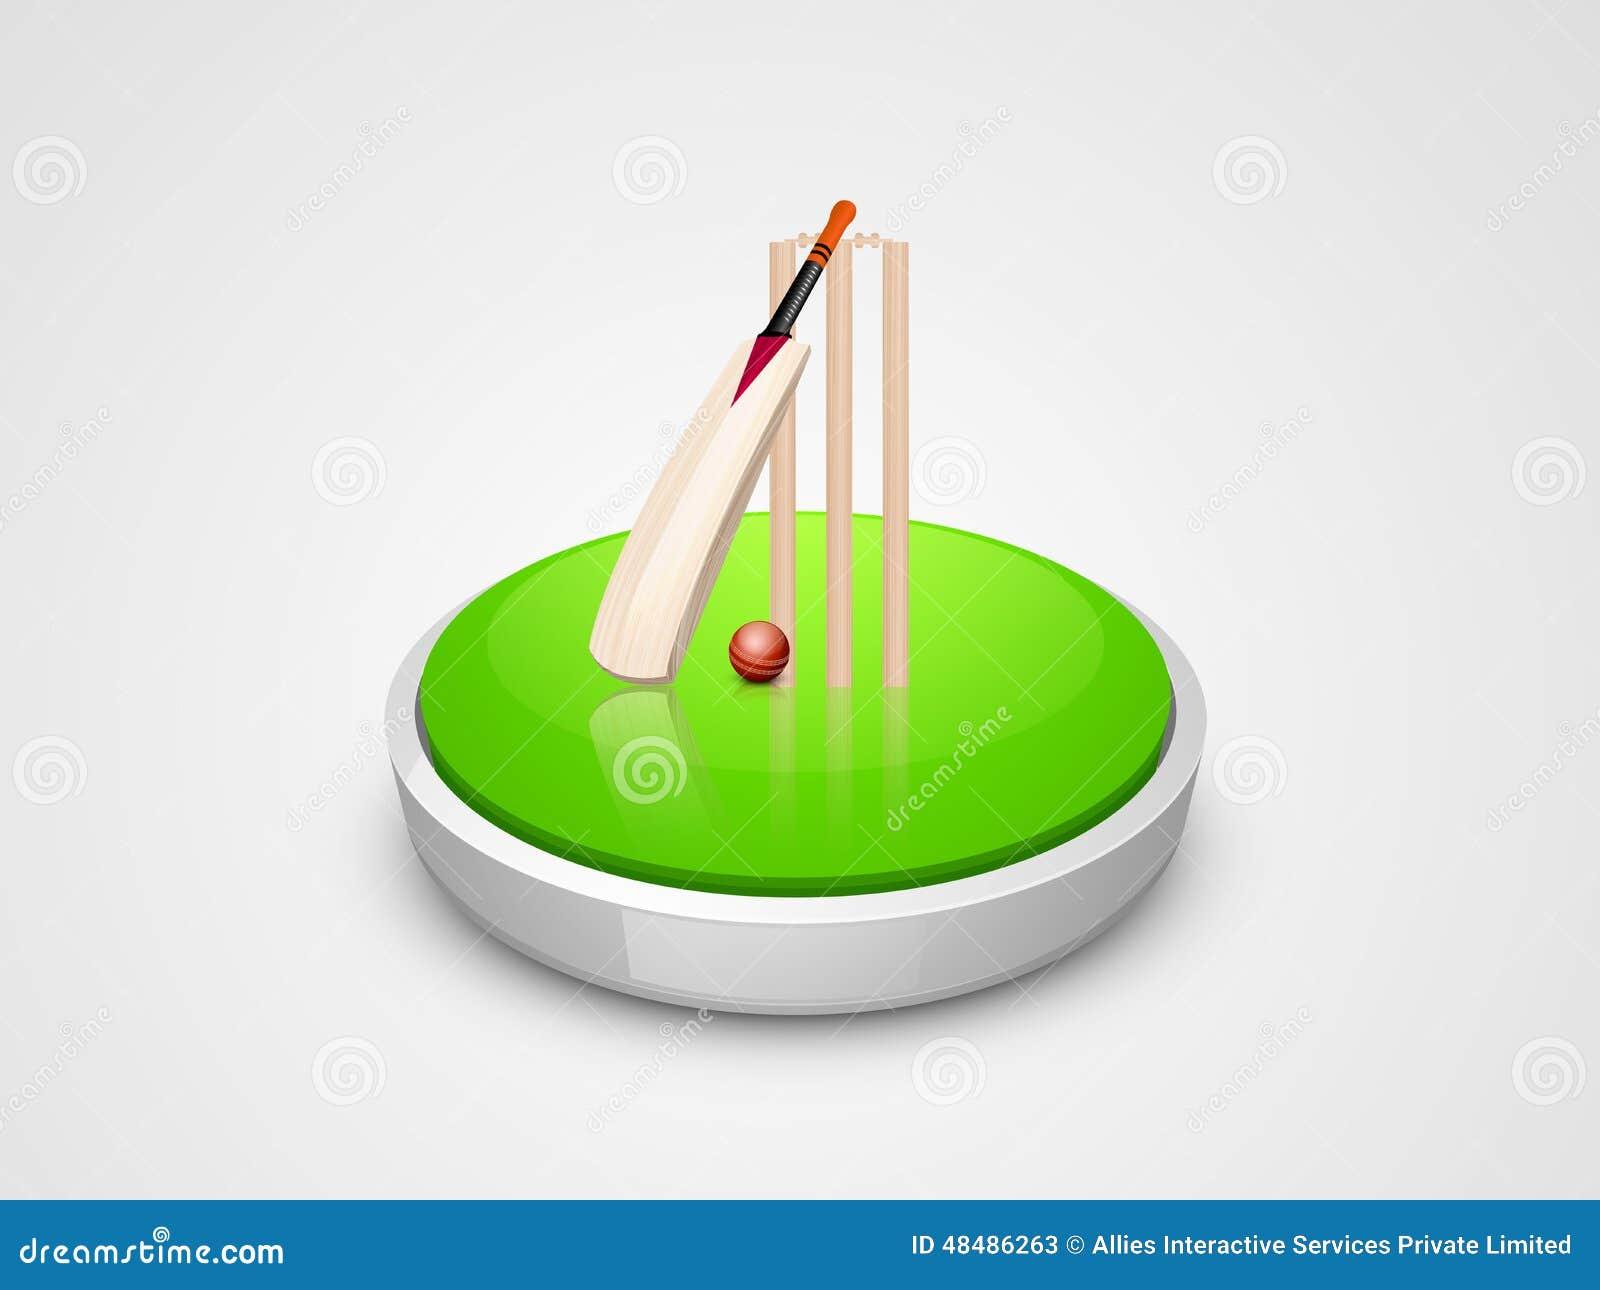 Cricket Bat, Ball And Wicket Stumps. Stock Illustration ...